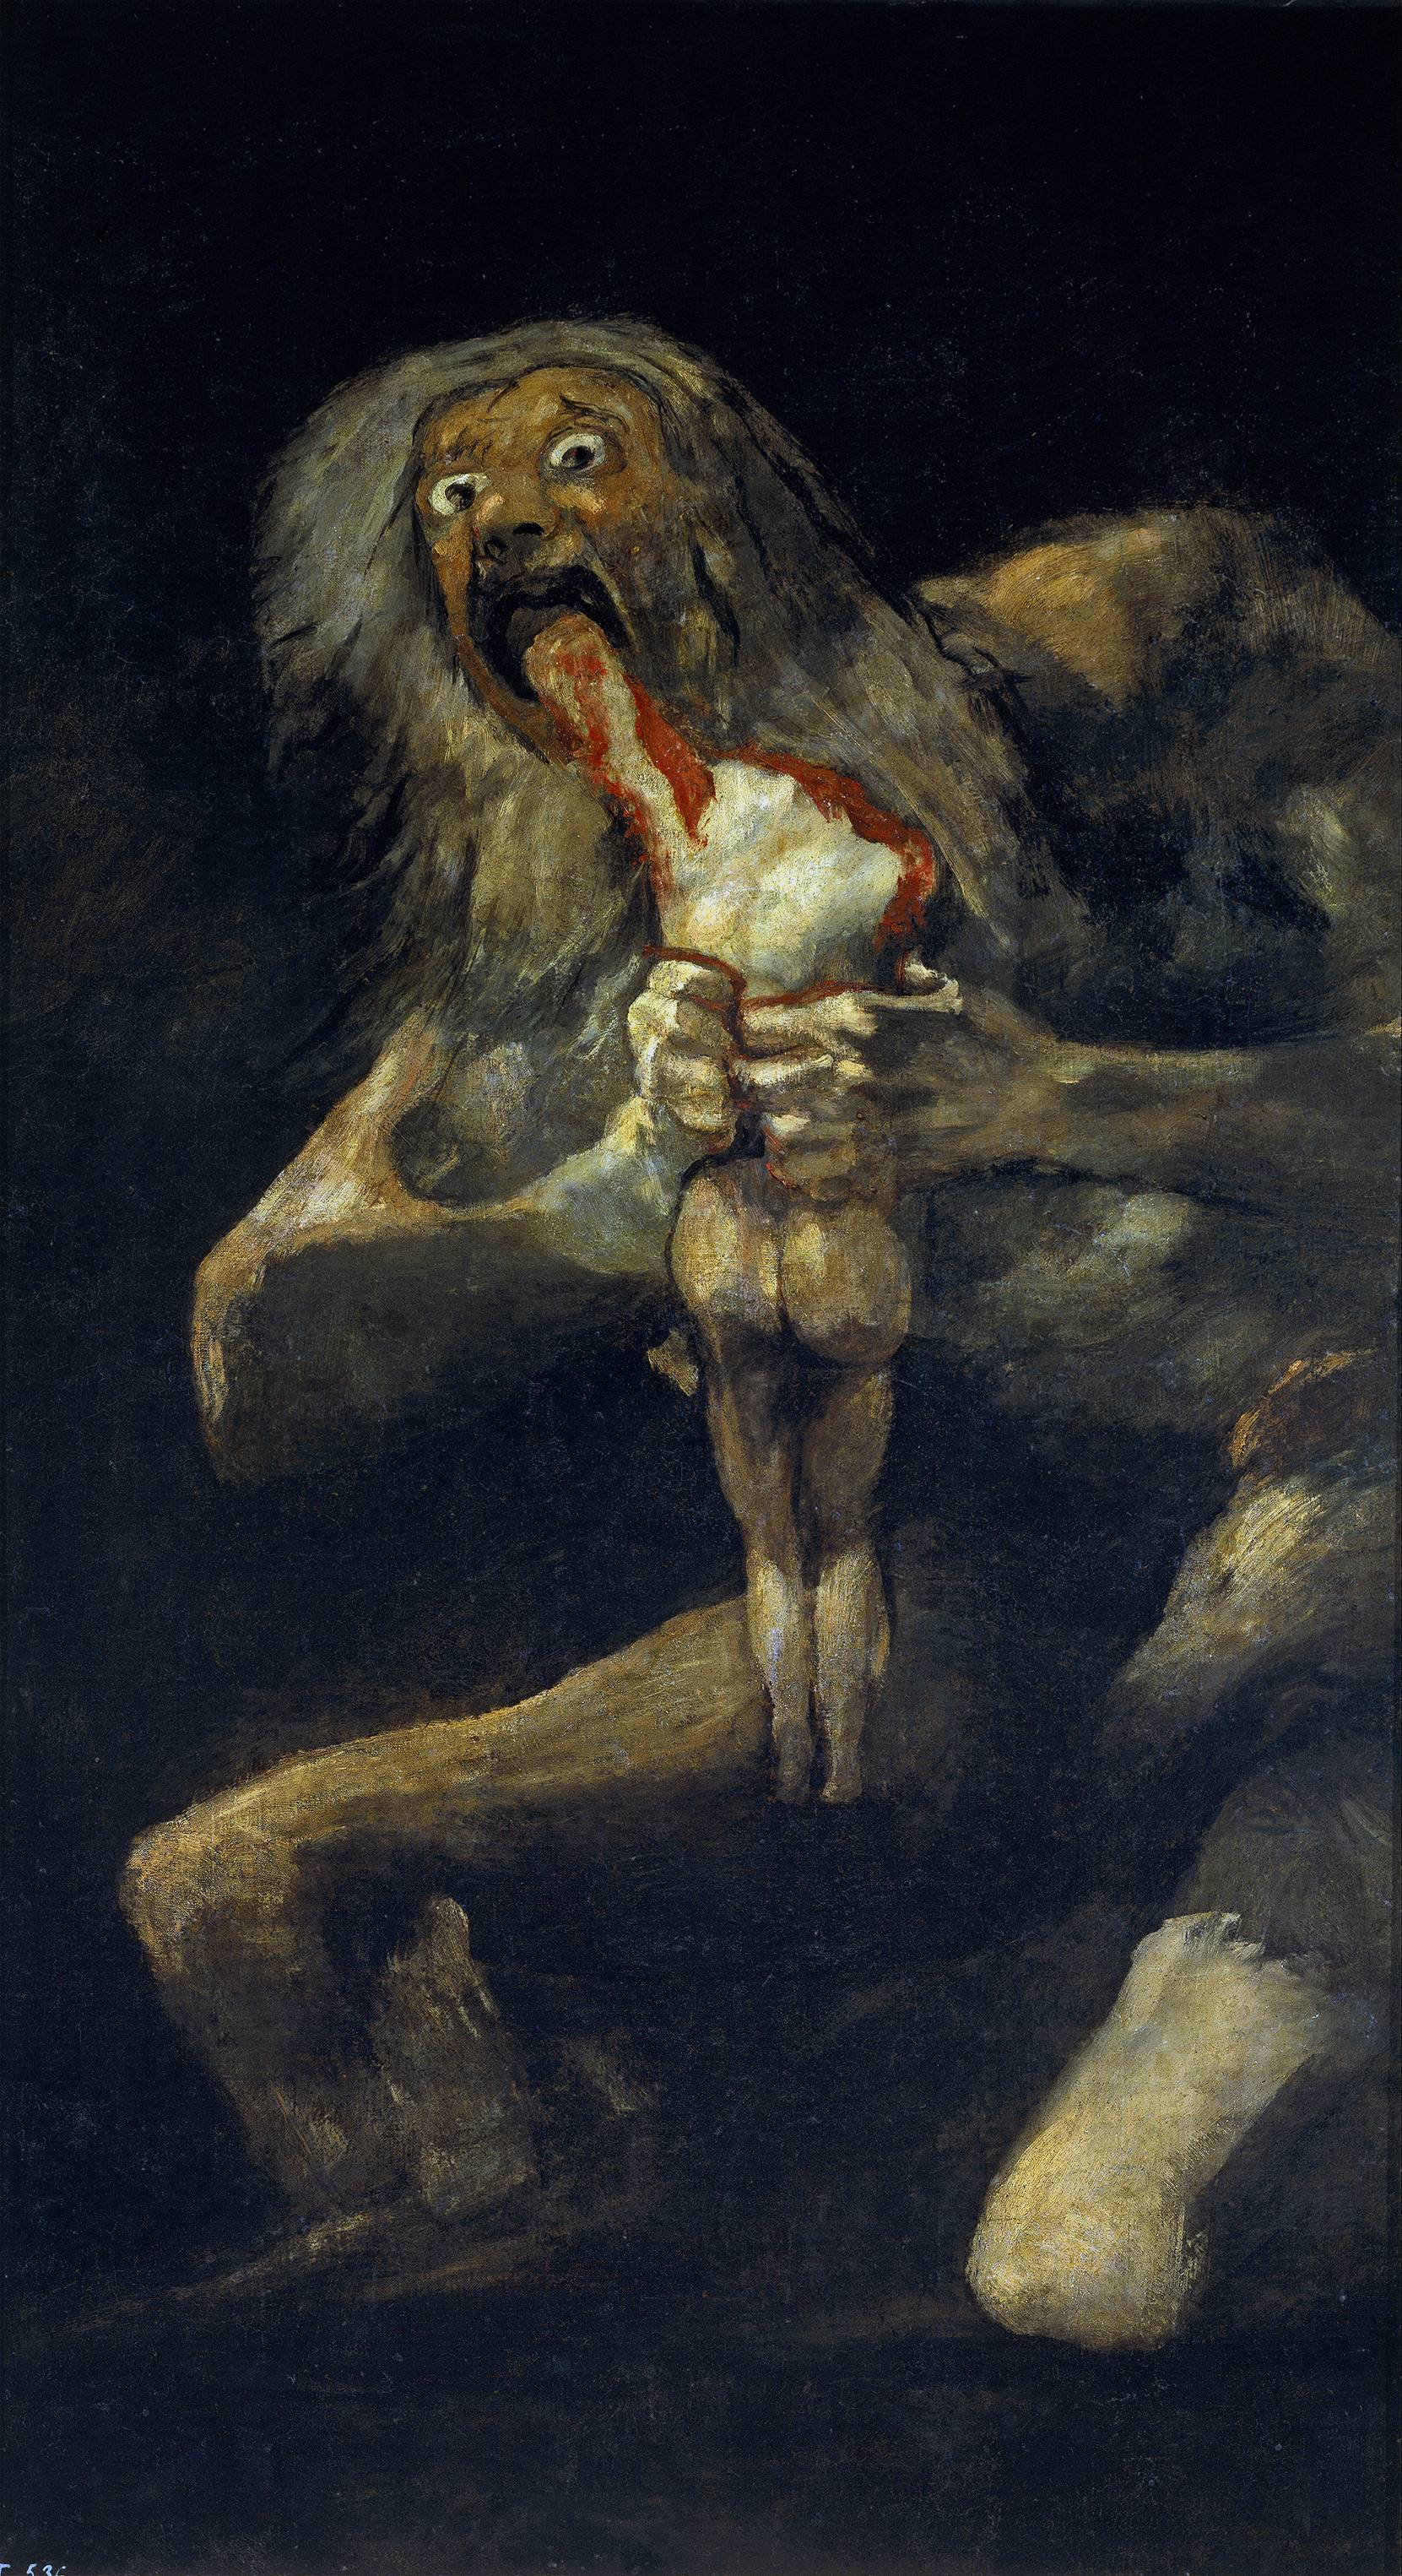 Francisco Goya, Saturn Devouring His Son (1819-1823)